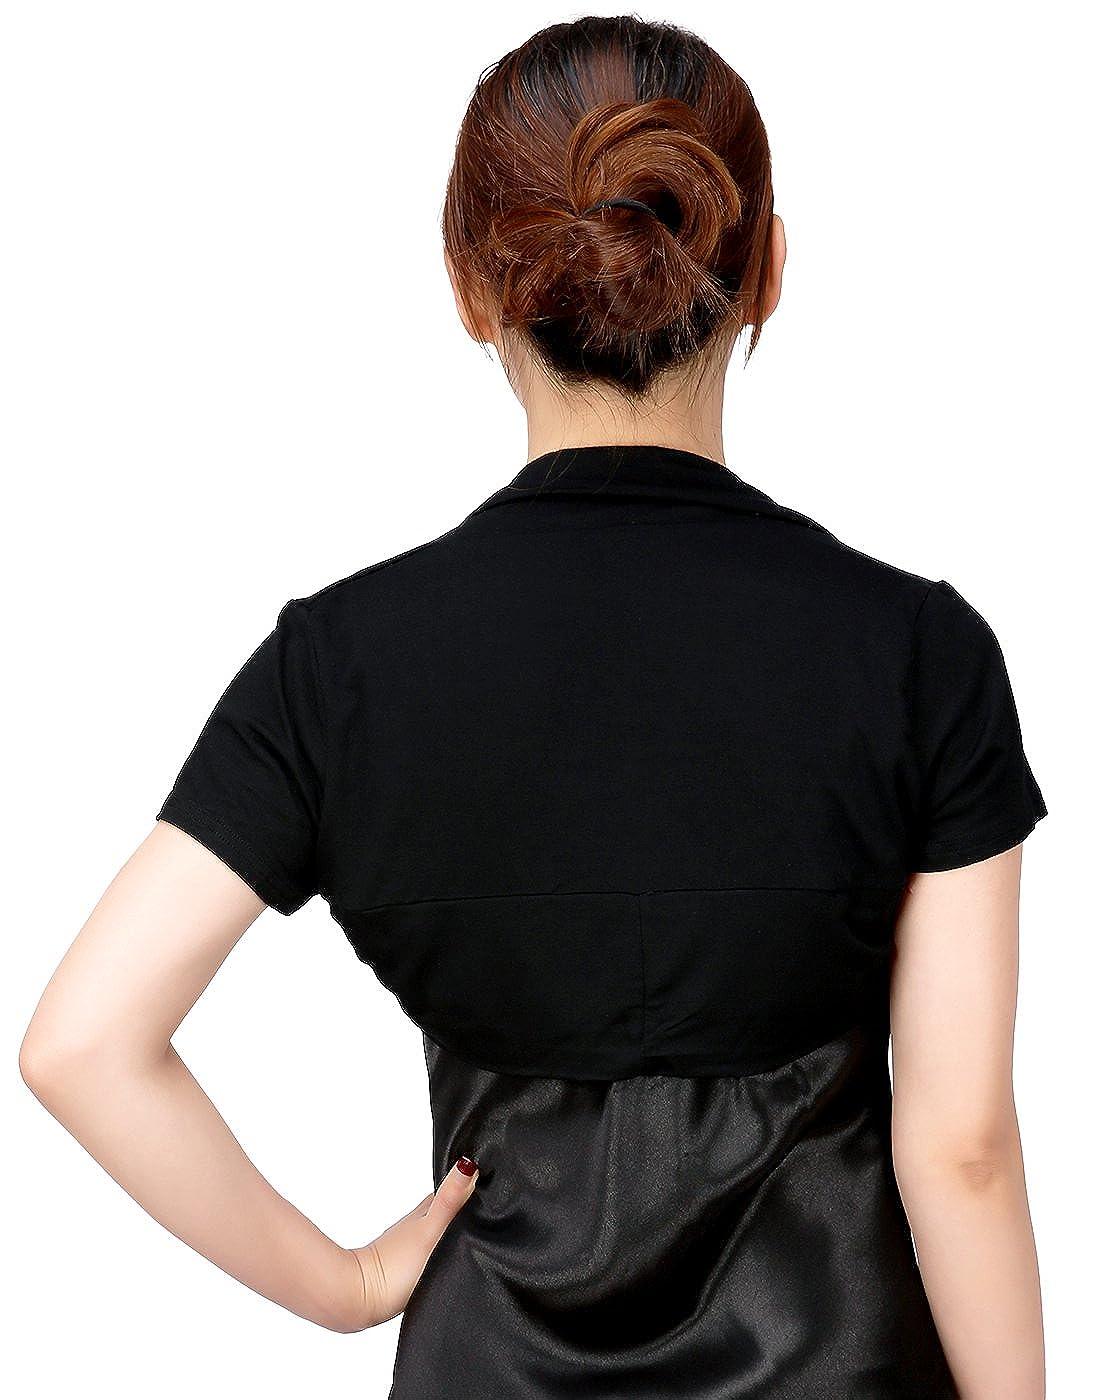 HDE Short Sleeve Bolero Jacket Shrug for Women S-4X Open Front Light Layering